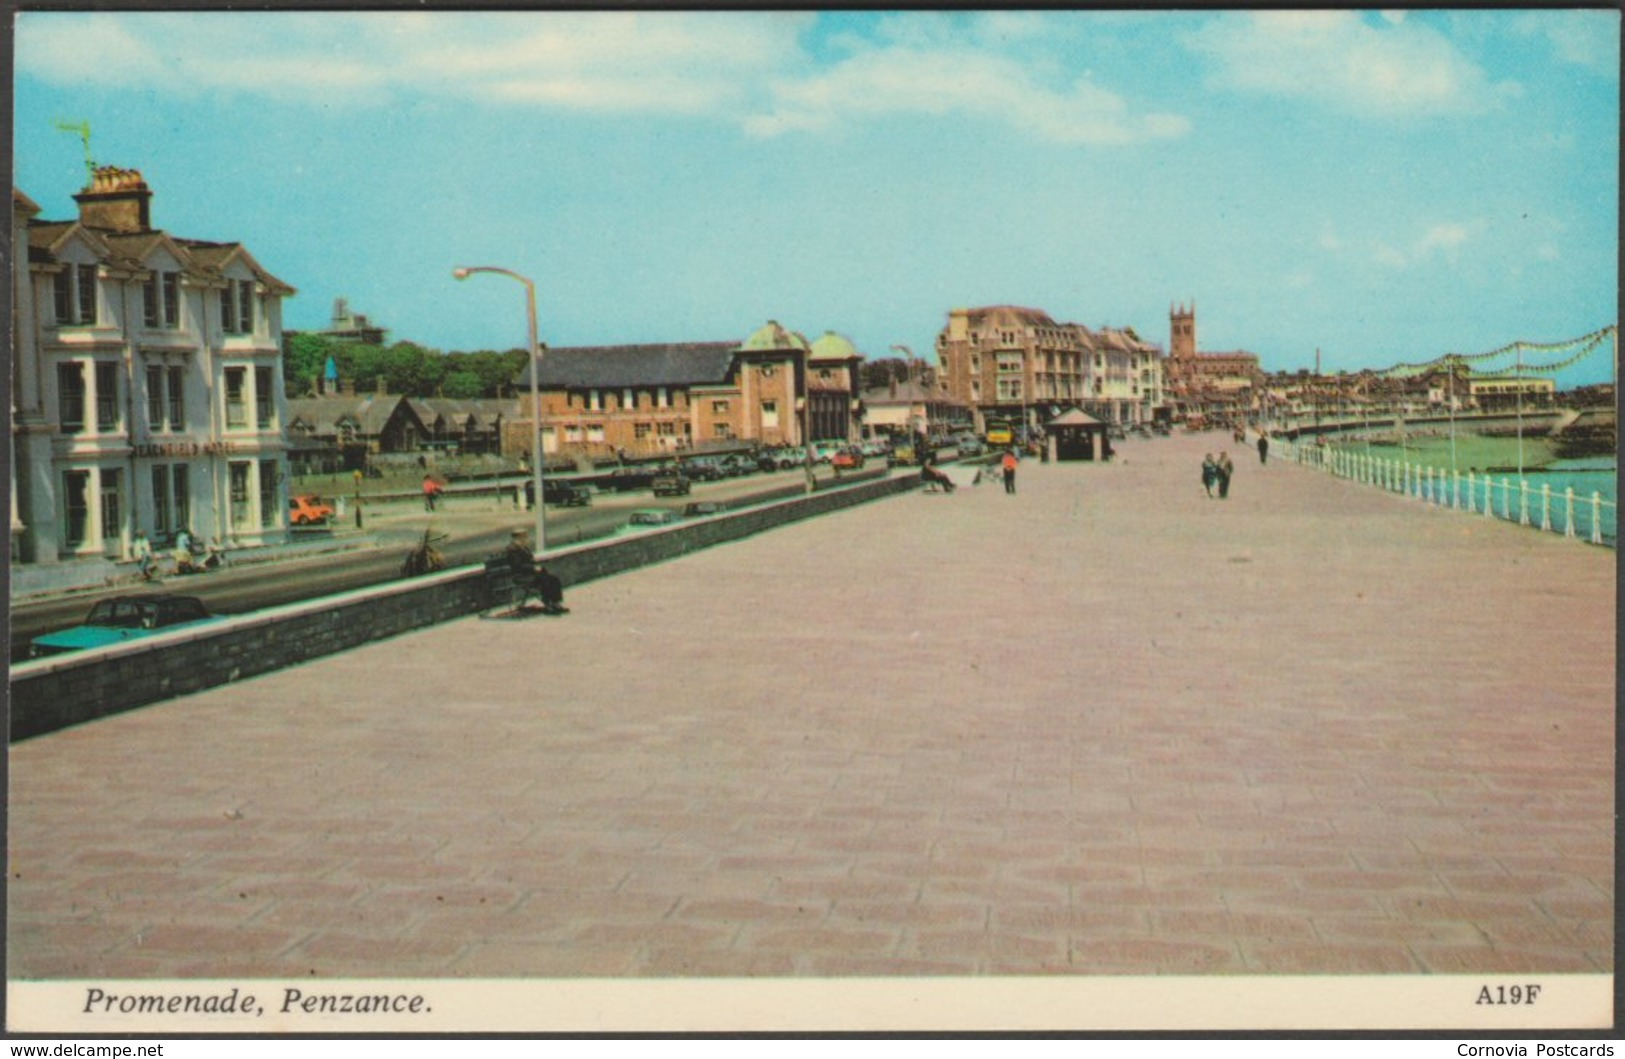 Promenade, Penzance, Cornwall, C.1970s - Harvey Barton Postcard - Other